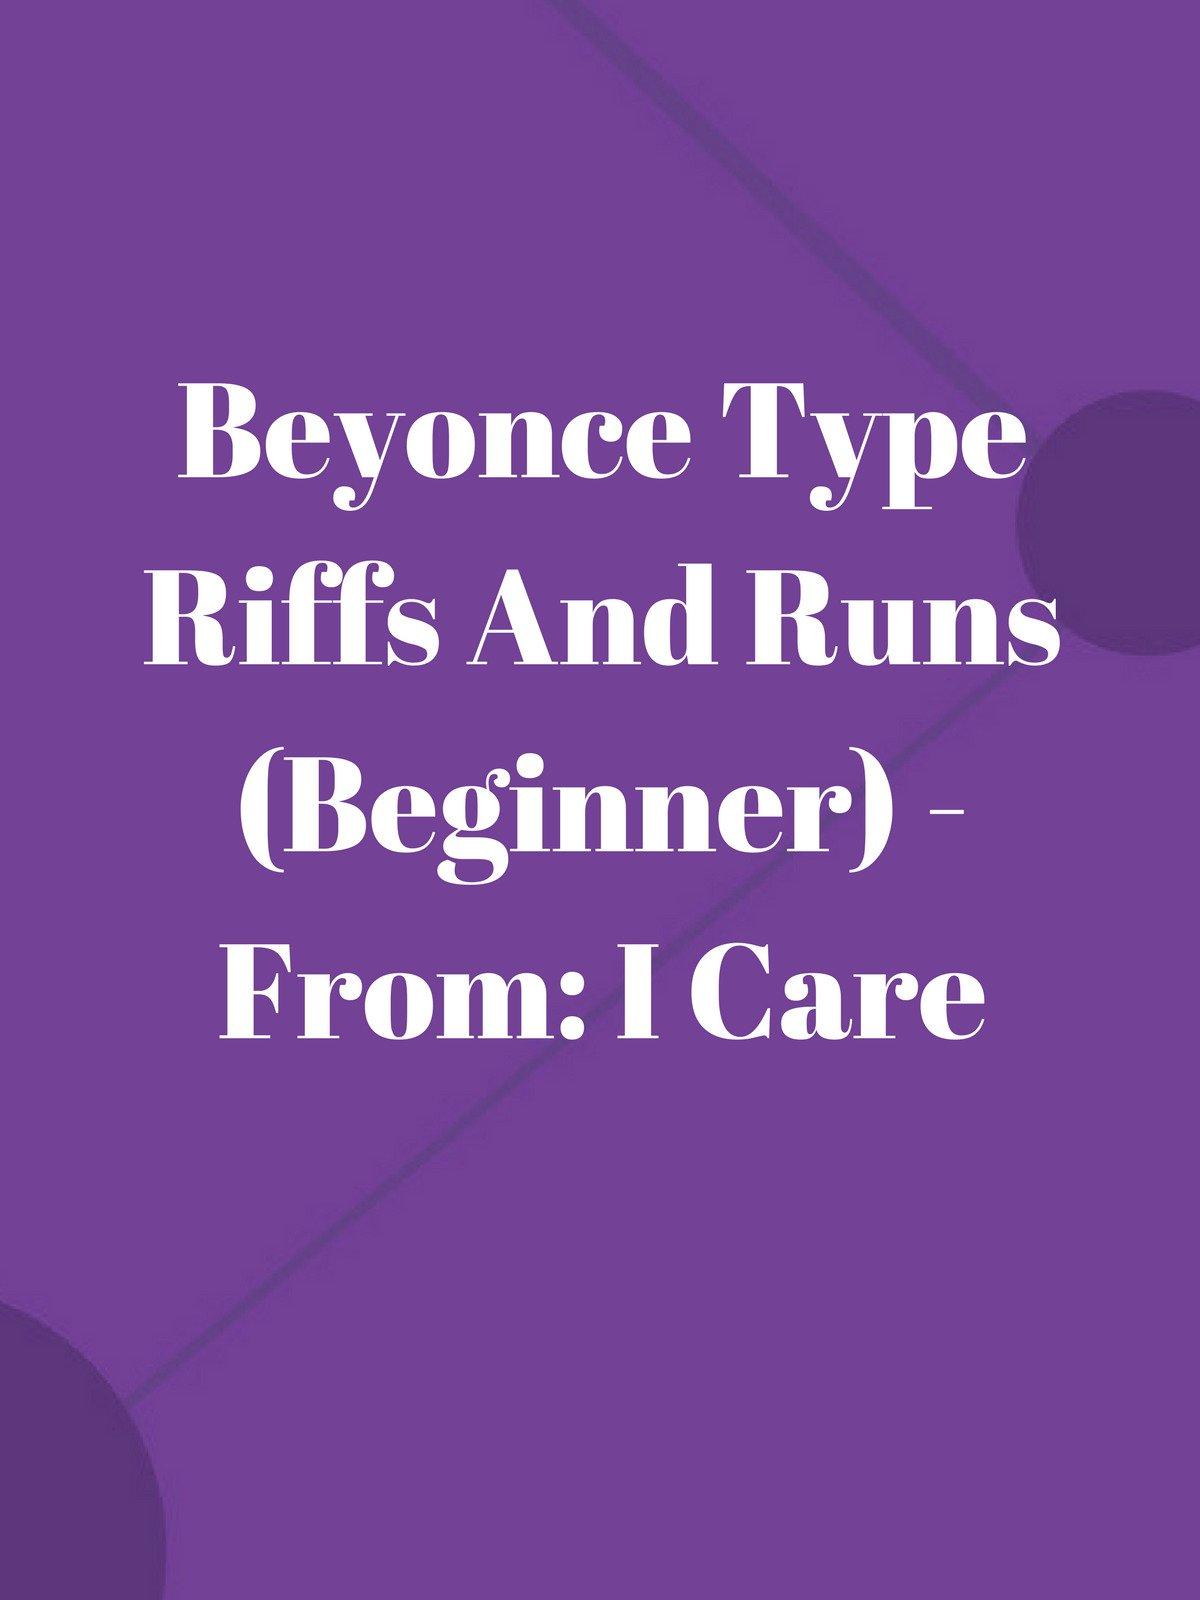 Beyonce Type Riffs And Runs (Beginner)